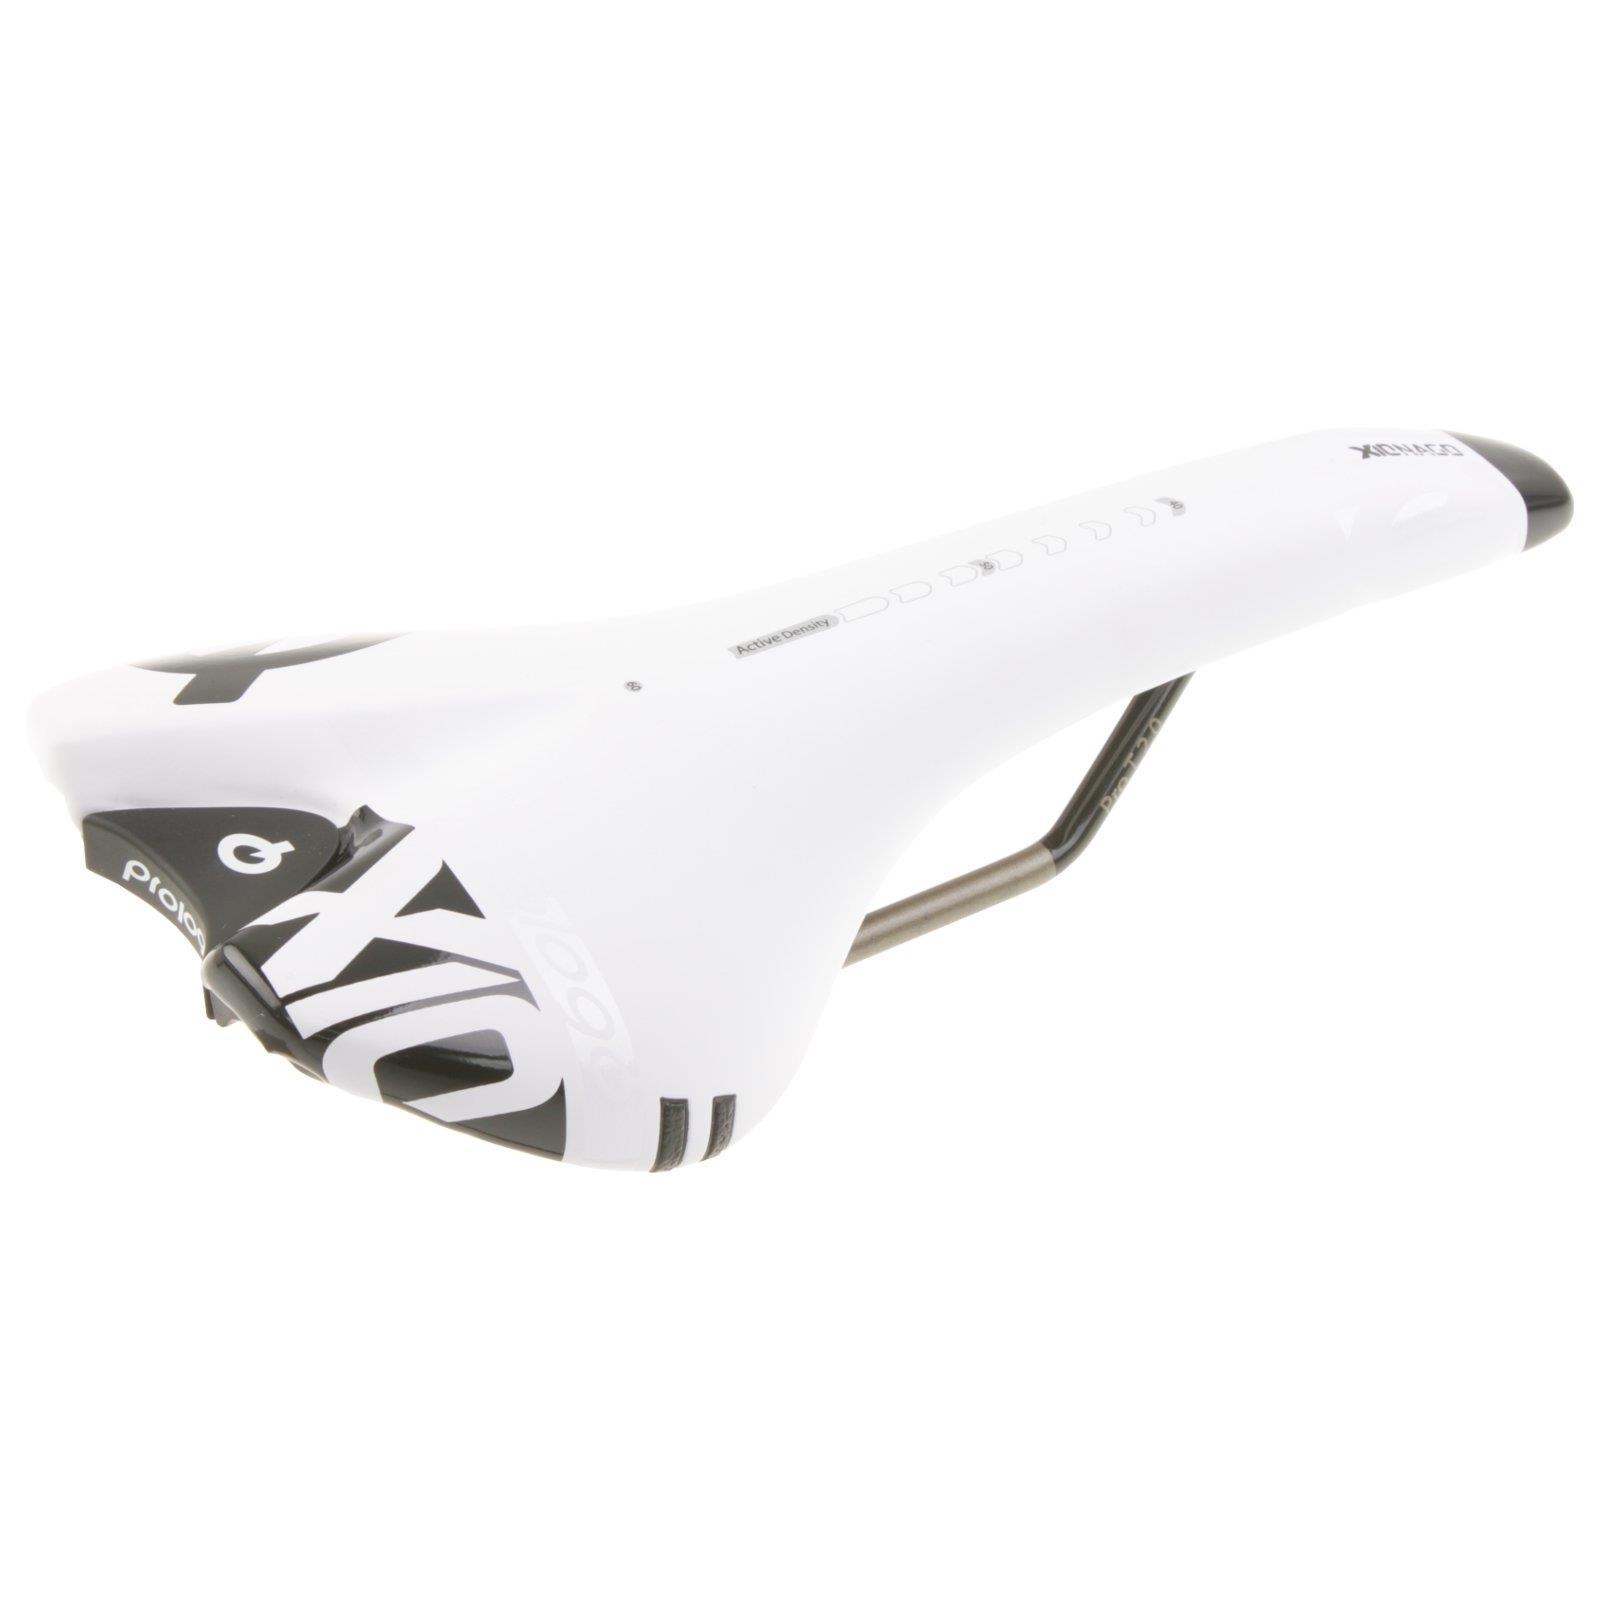 Prologo Sattel MTB Rennrad Road Road Road Mountain Bike Fahrrad Rad Sport Komfort Touring  | Sonderaktionen zum Jahresende  37e3d0